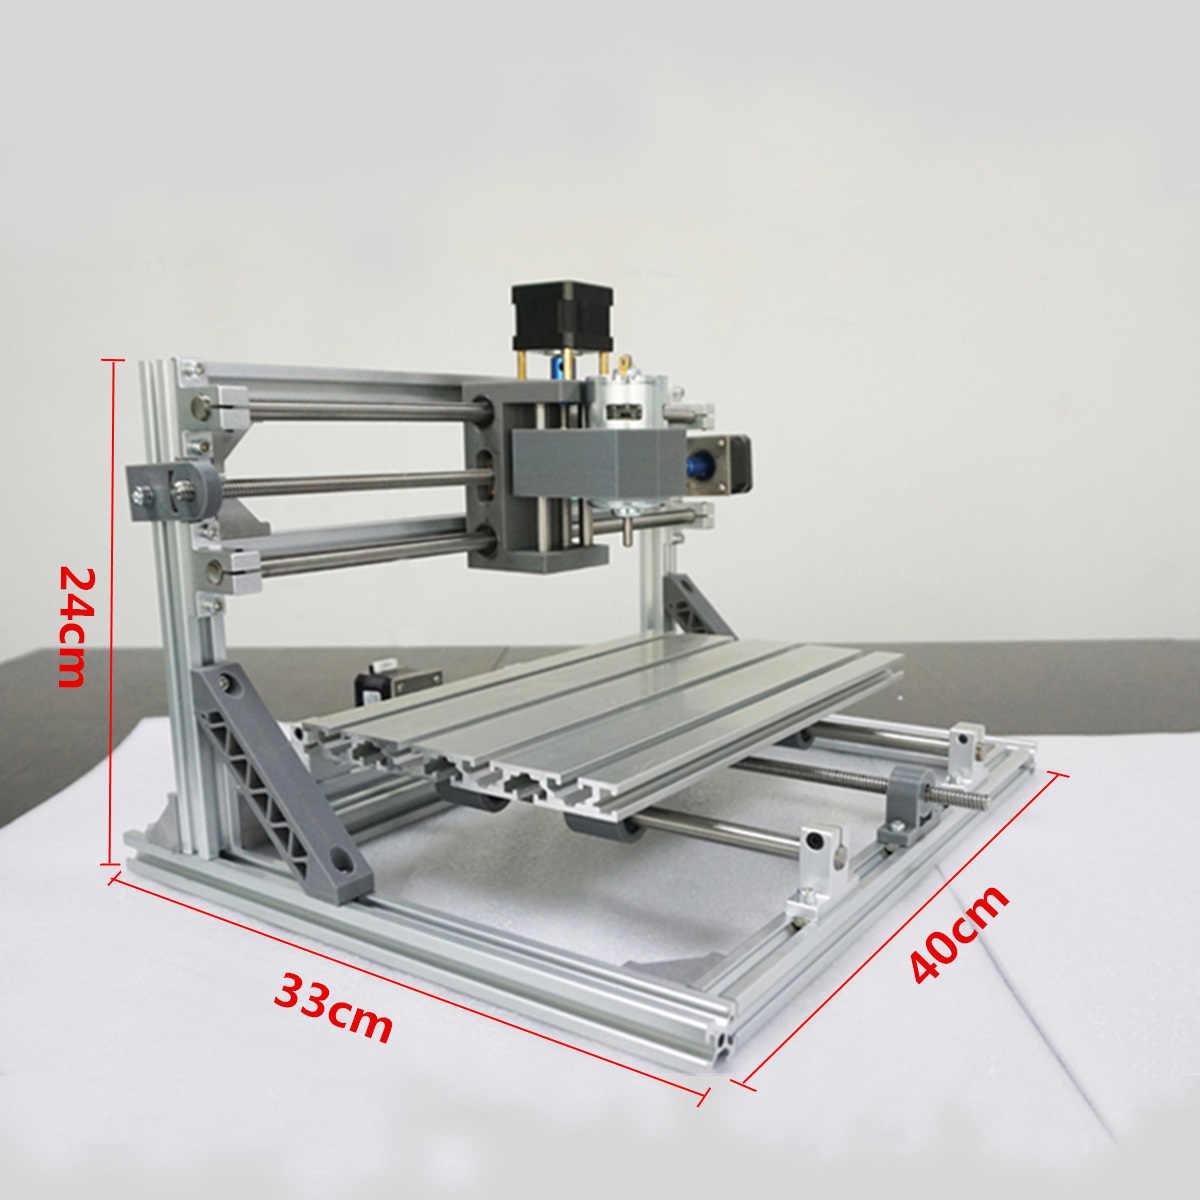 DIY מיני CNC נתב לייזר מכונה 3 ציר 3018 GRBL בקרת Pcb Pvc כרסום עץ נתב עץ נתב לייזר חריטה